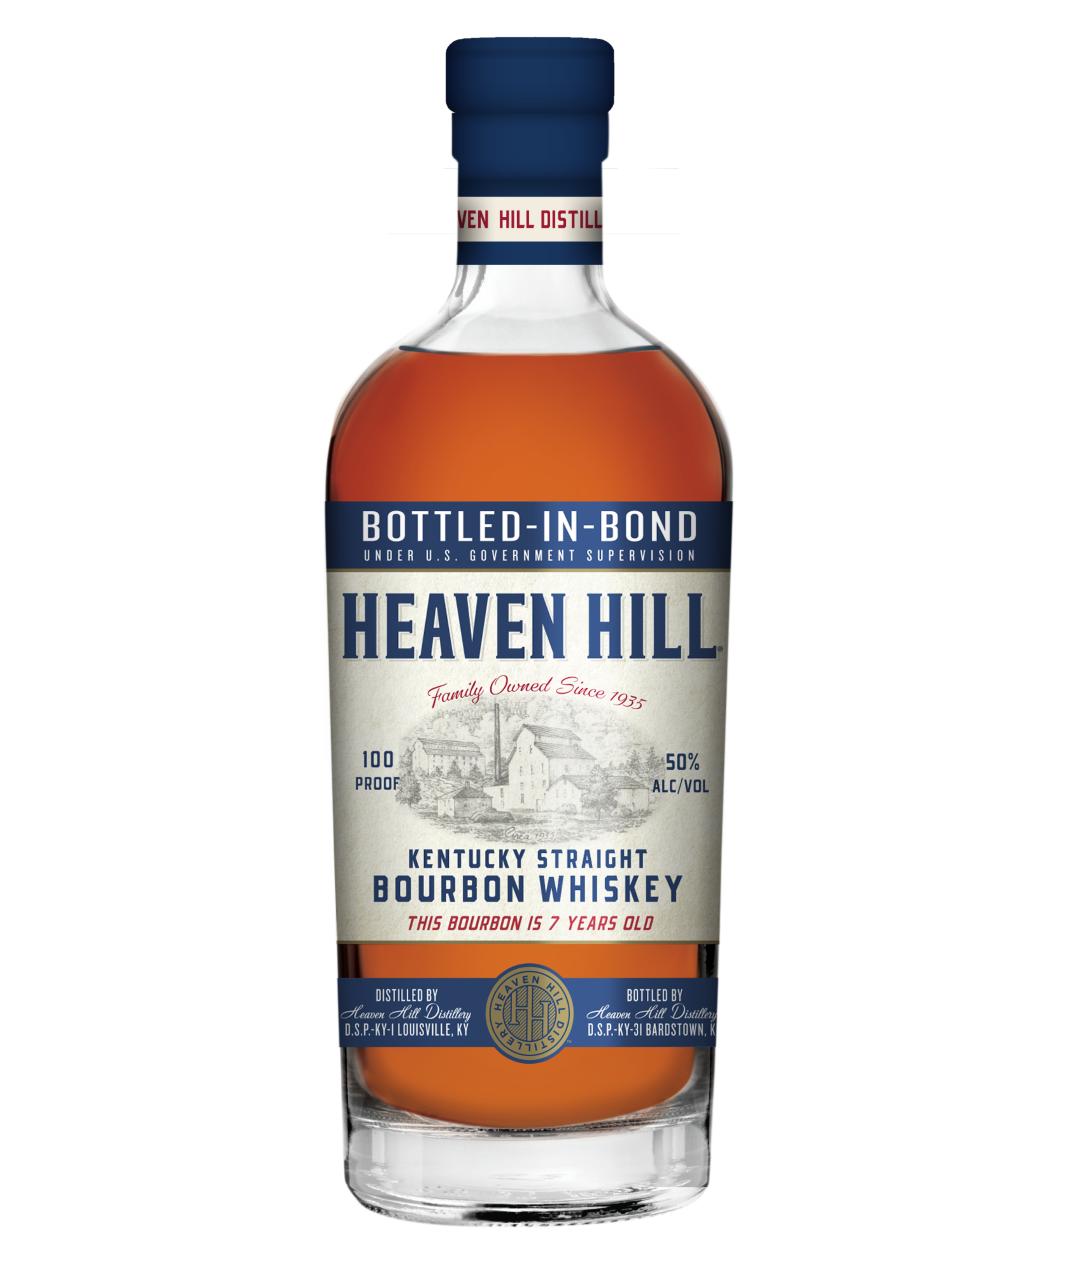 Heaven Hill Bottled-in-Bond Bourbon 7 Years Old